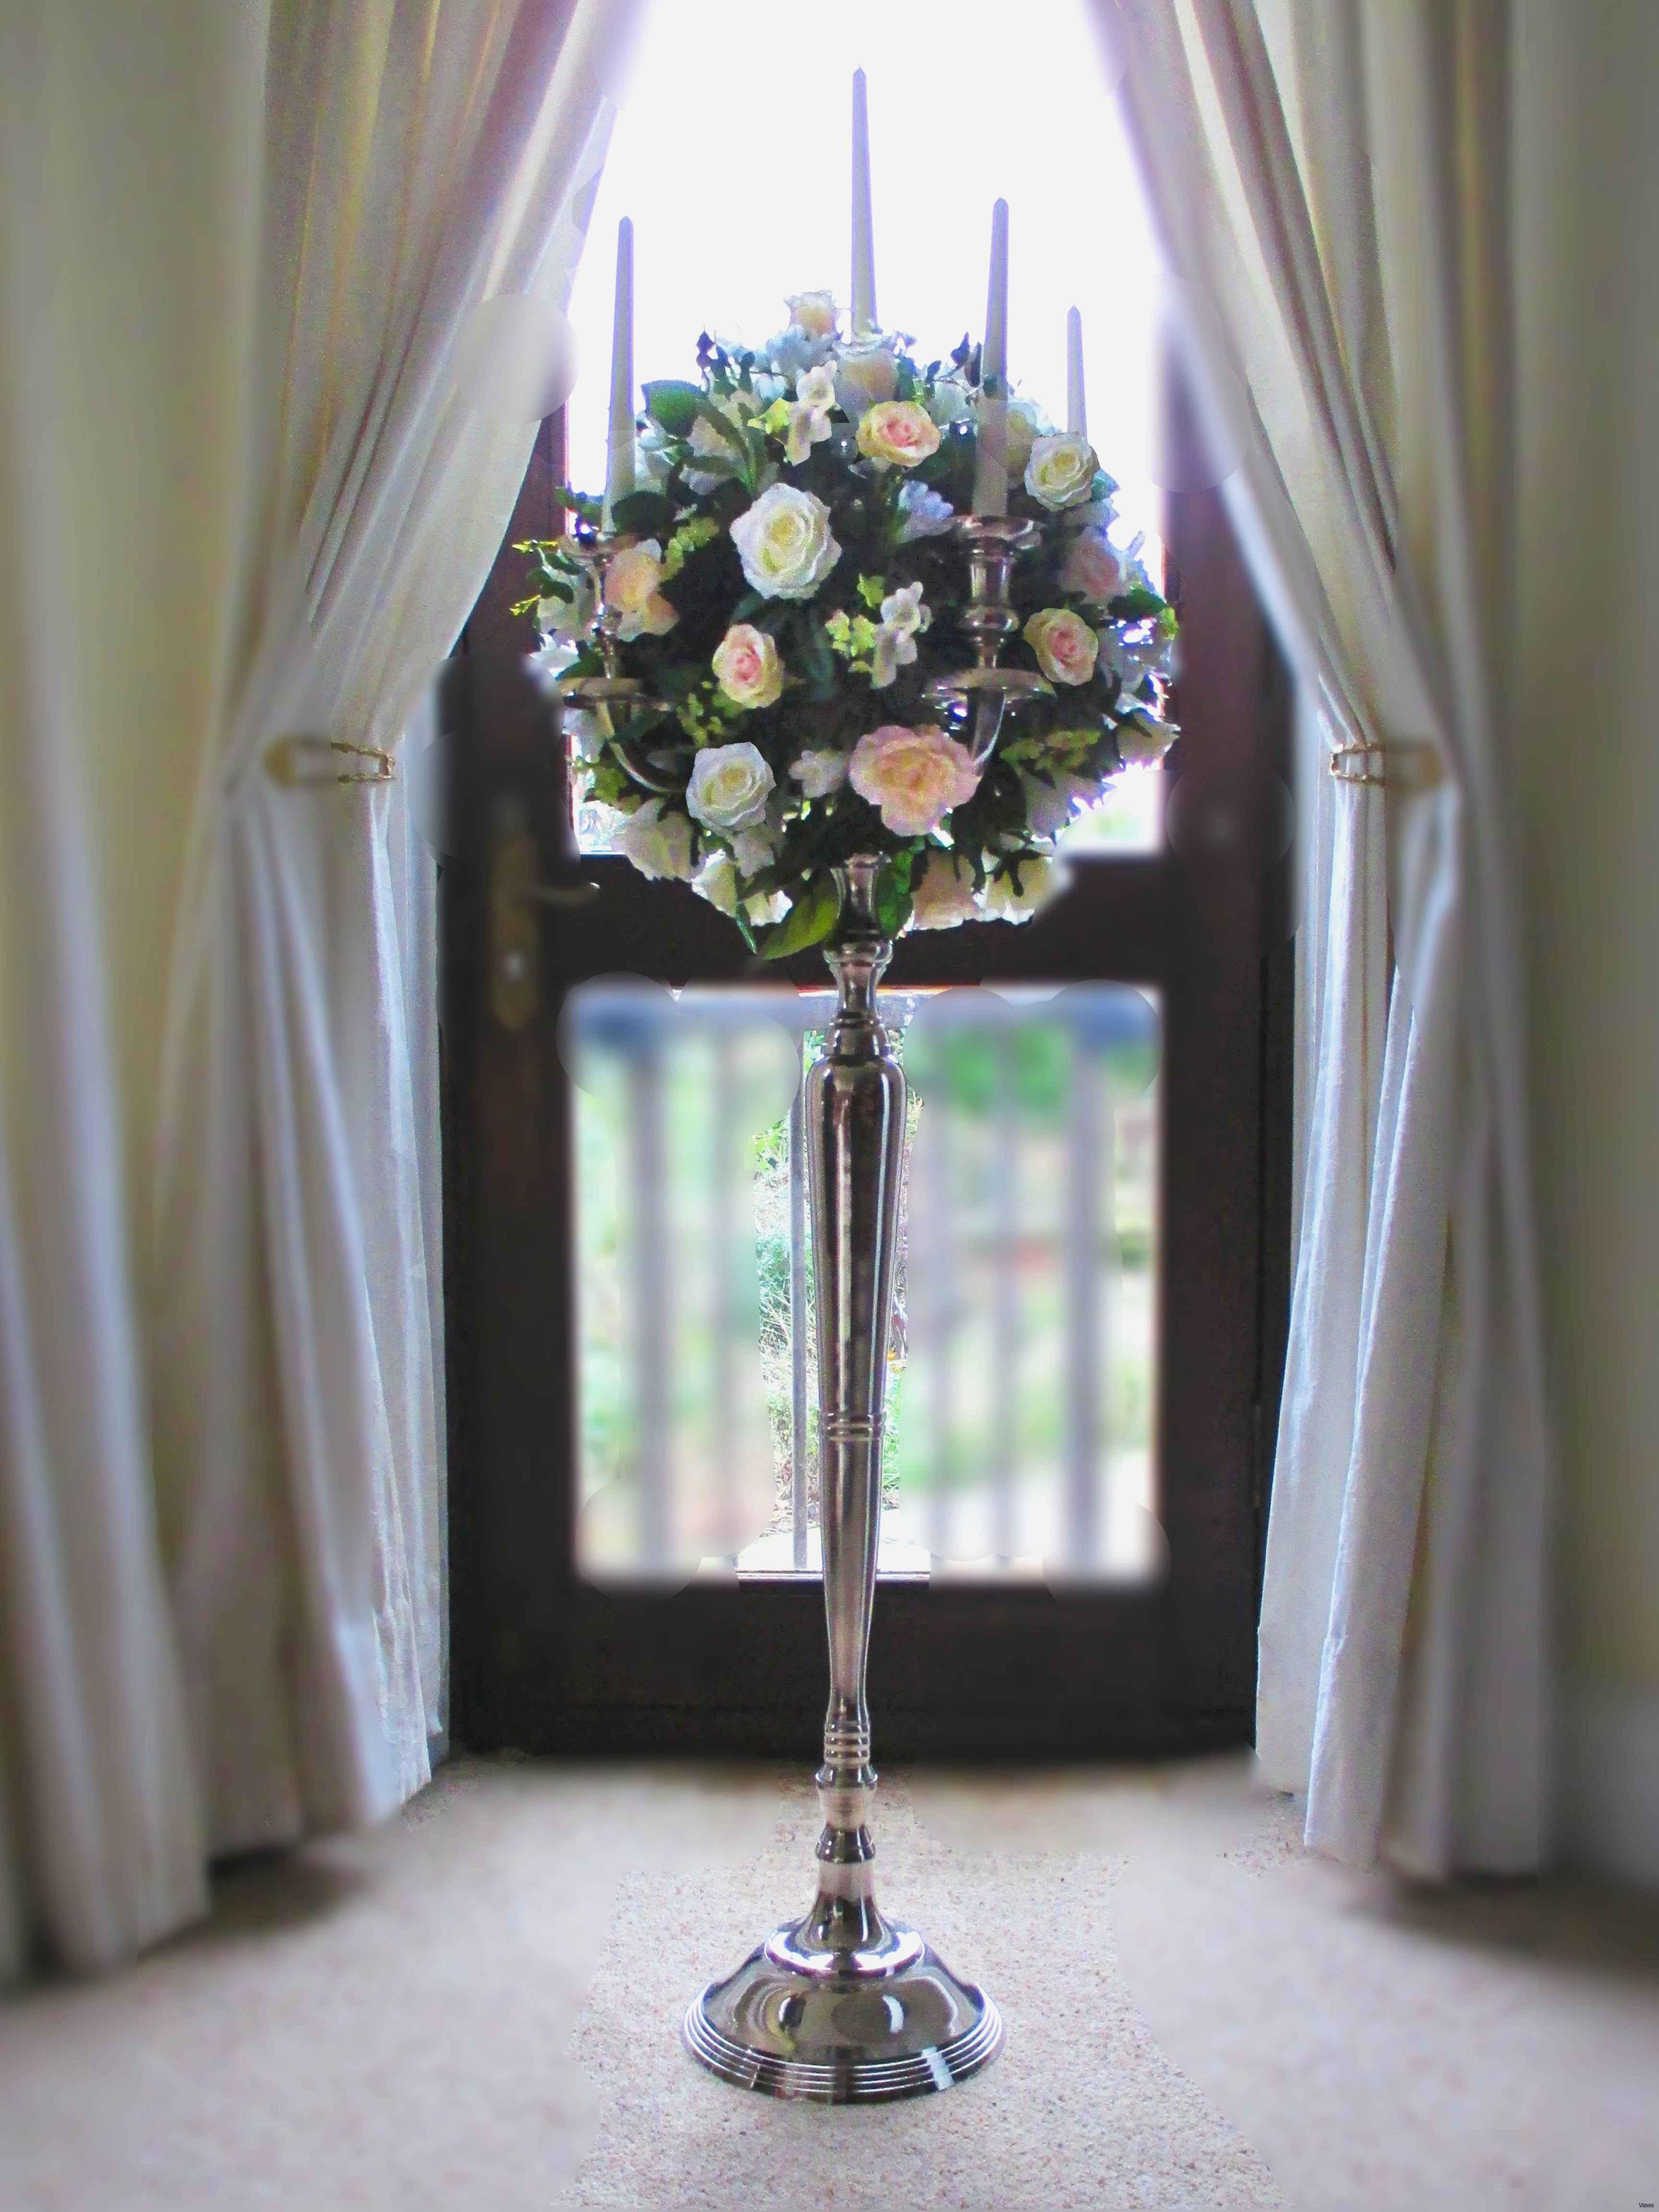 vases in bulk for wedding of elegant fall wedding bouquet wedding theme regarding cheap wedding bouquets packages 5397h vases silver vase leeds i 0d design fall silk flower